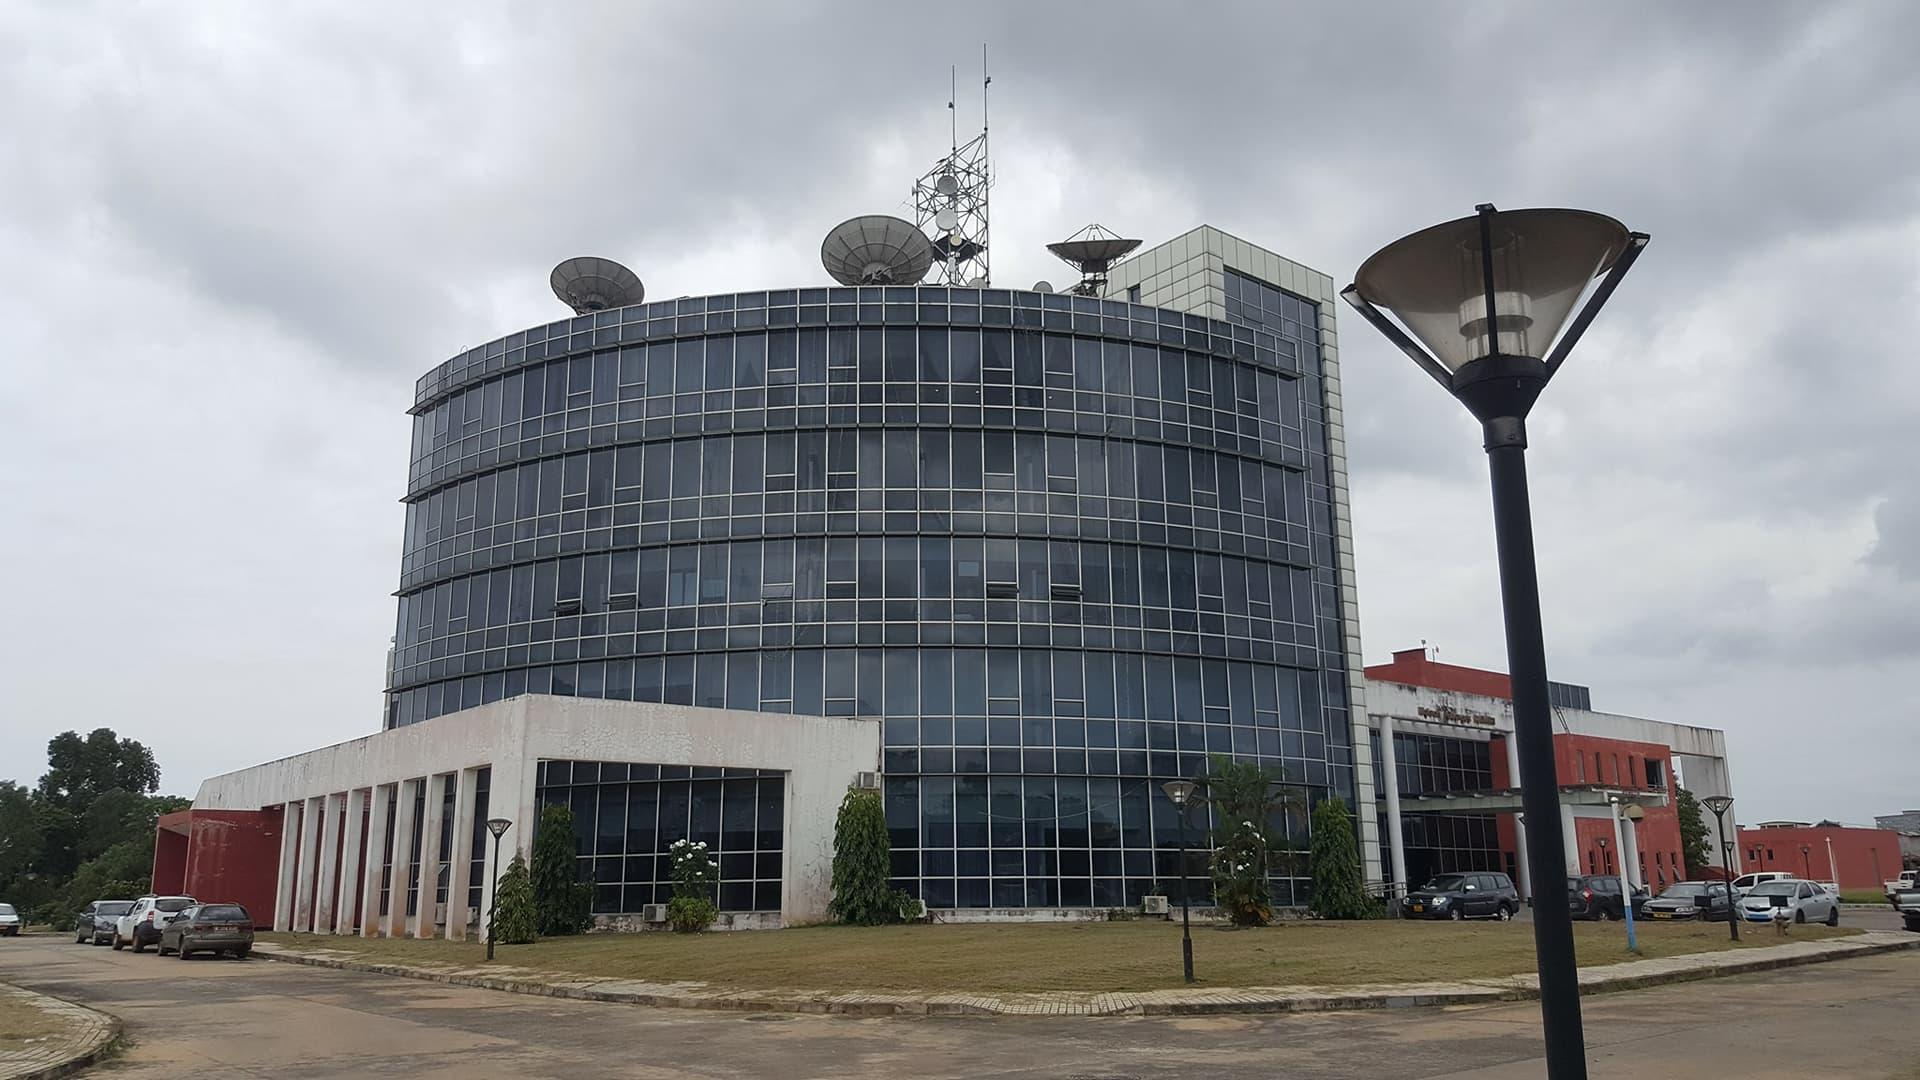 Silence inquiétant sur Radio Gabon ce matin